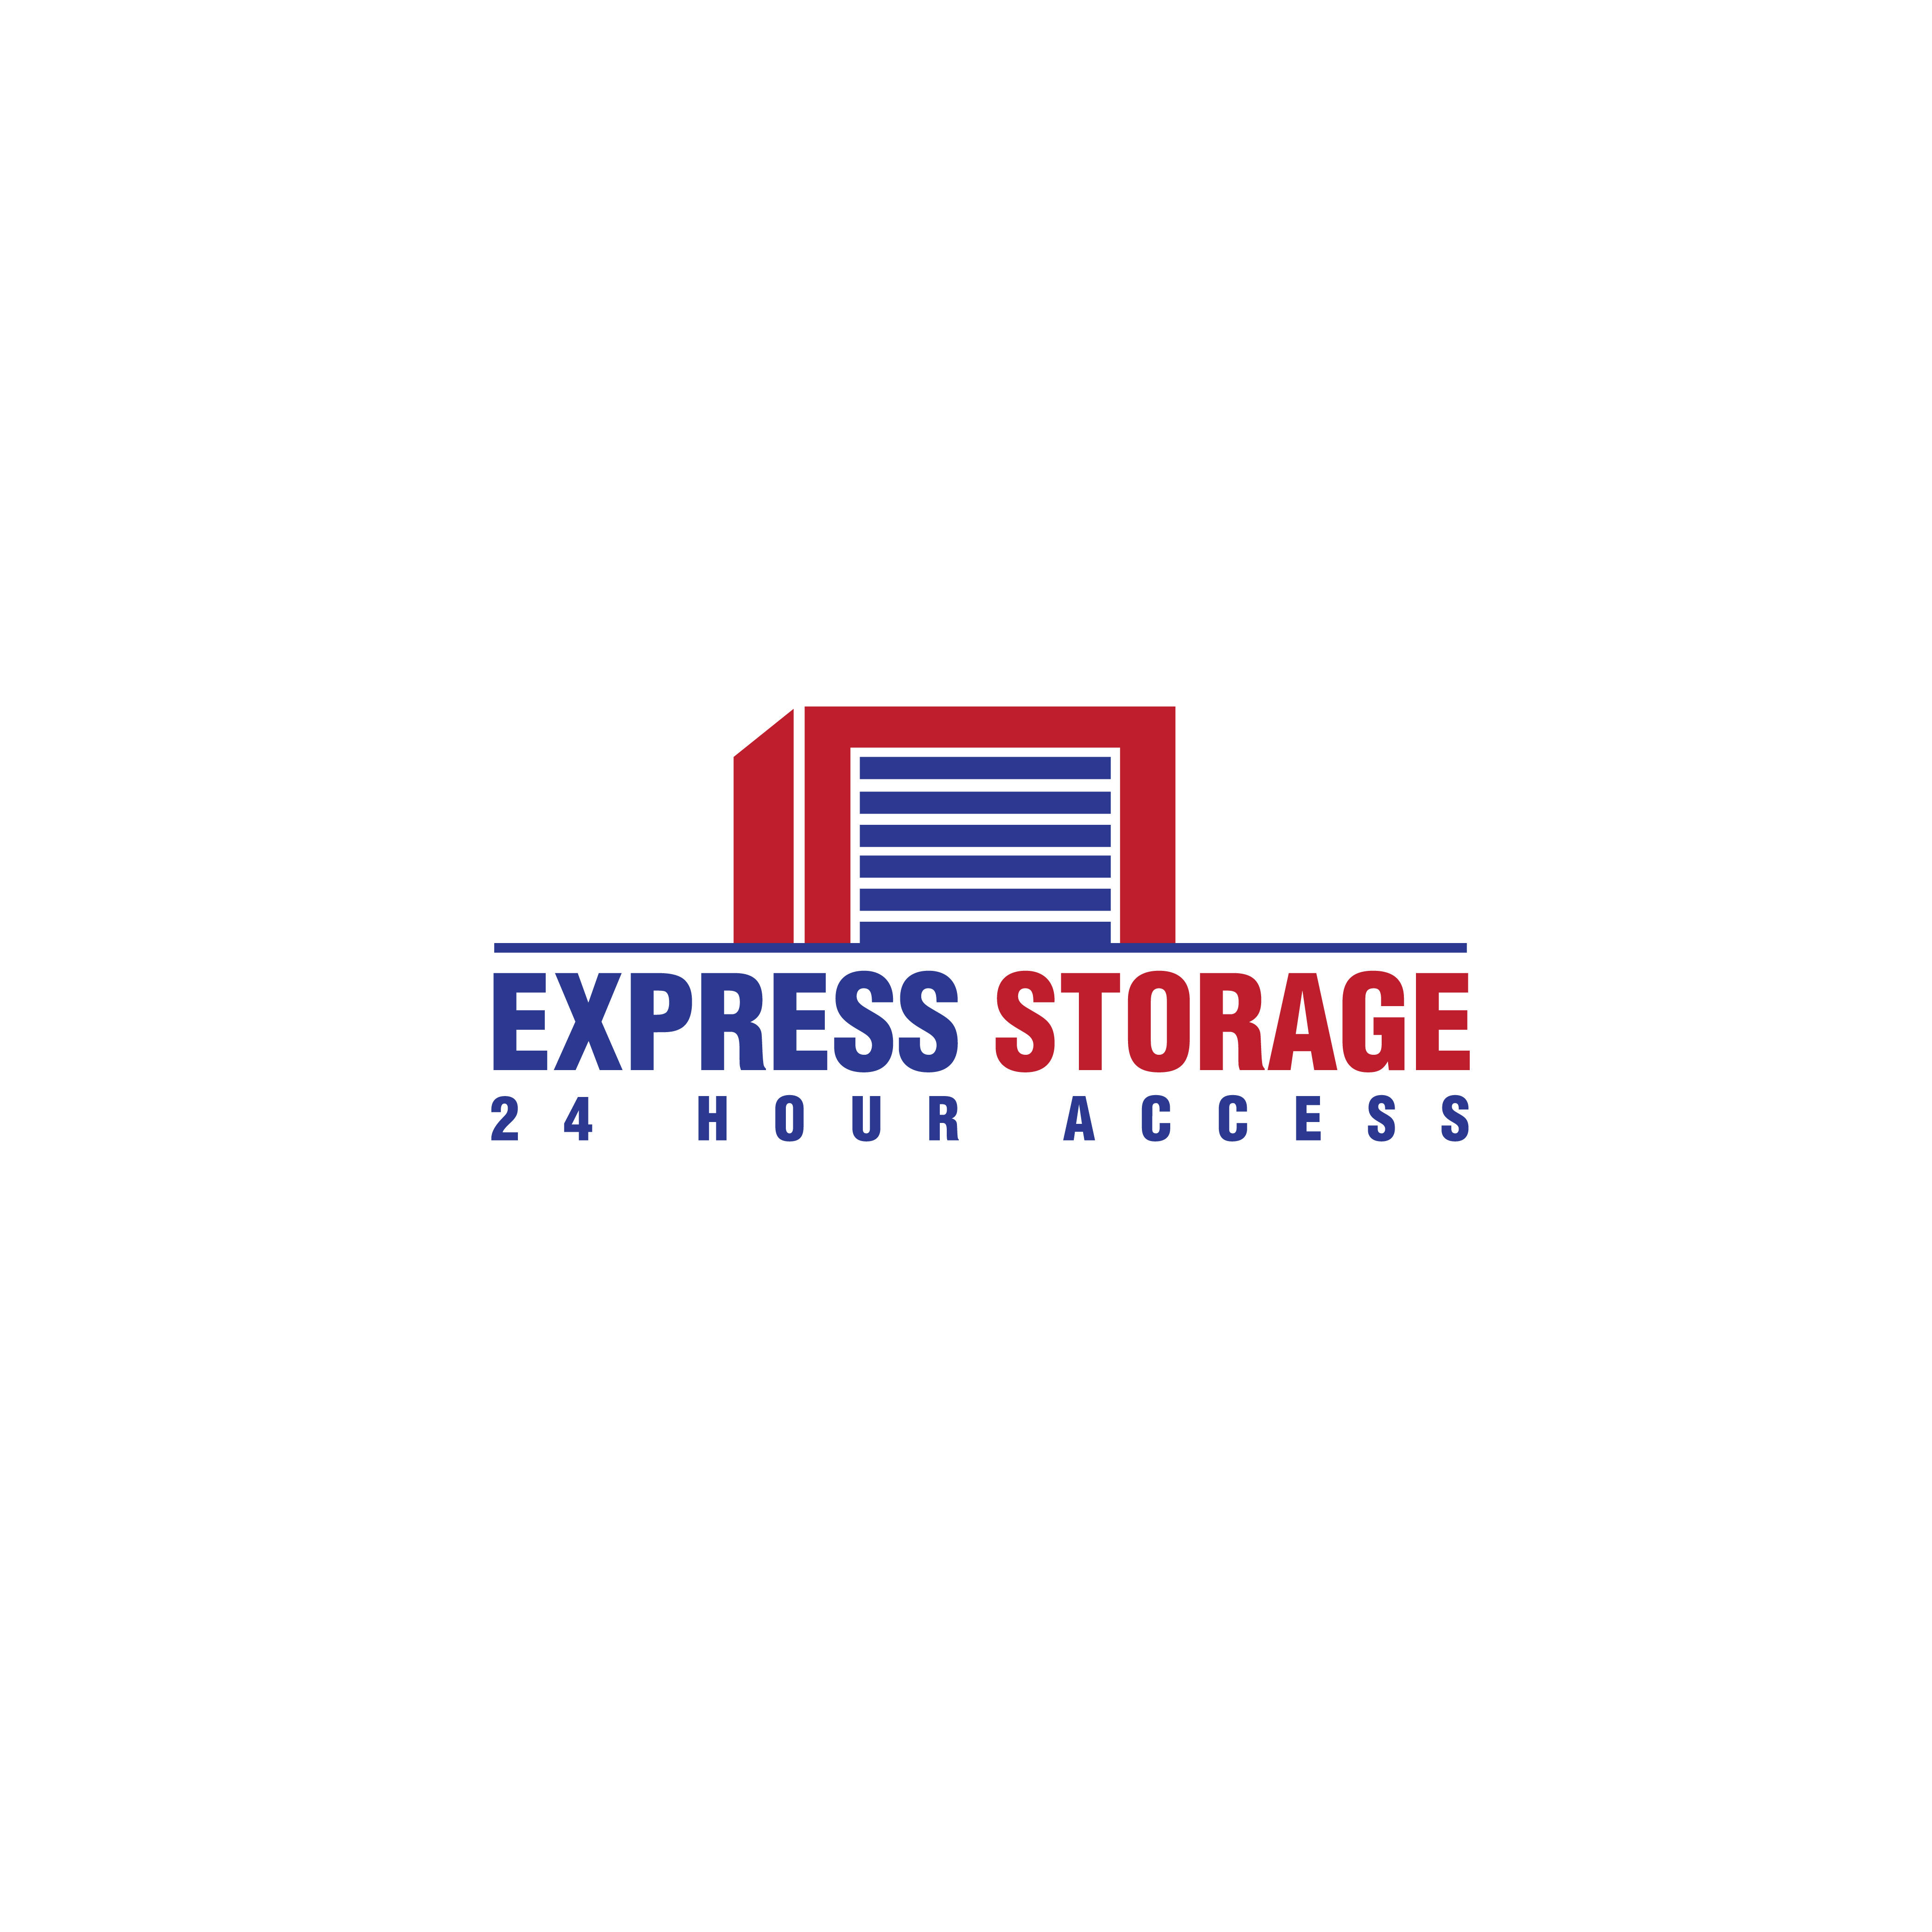 Express Storage